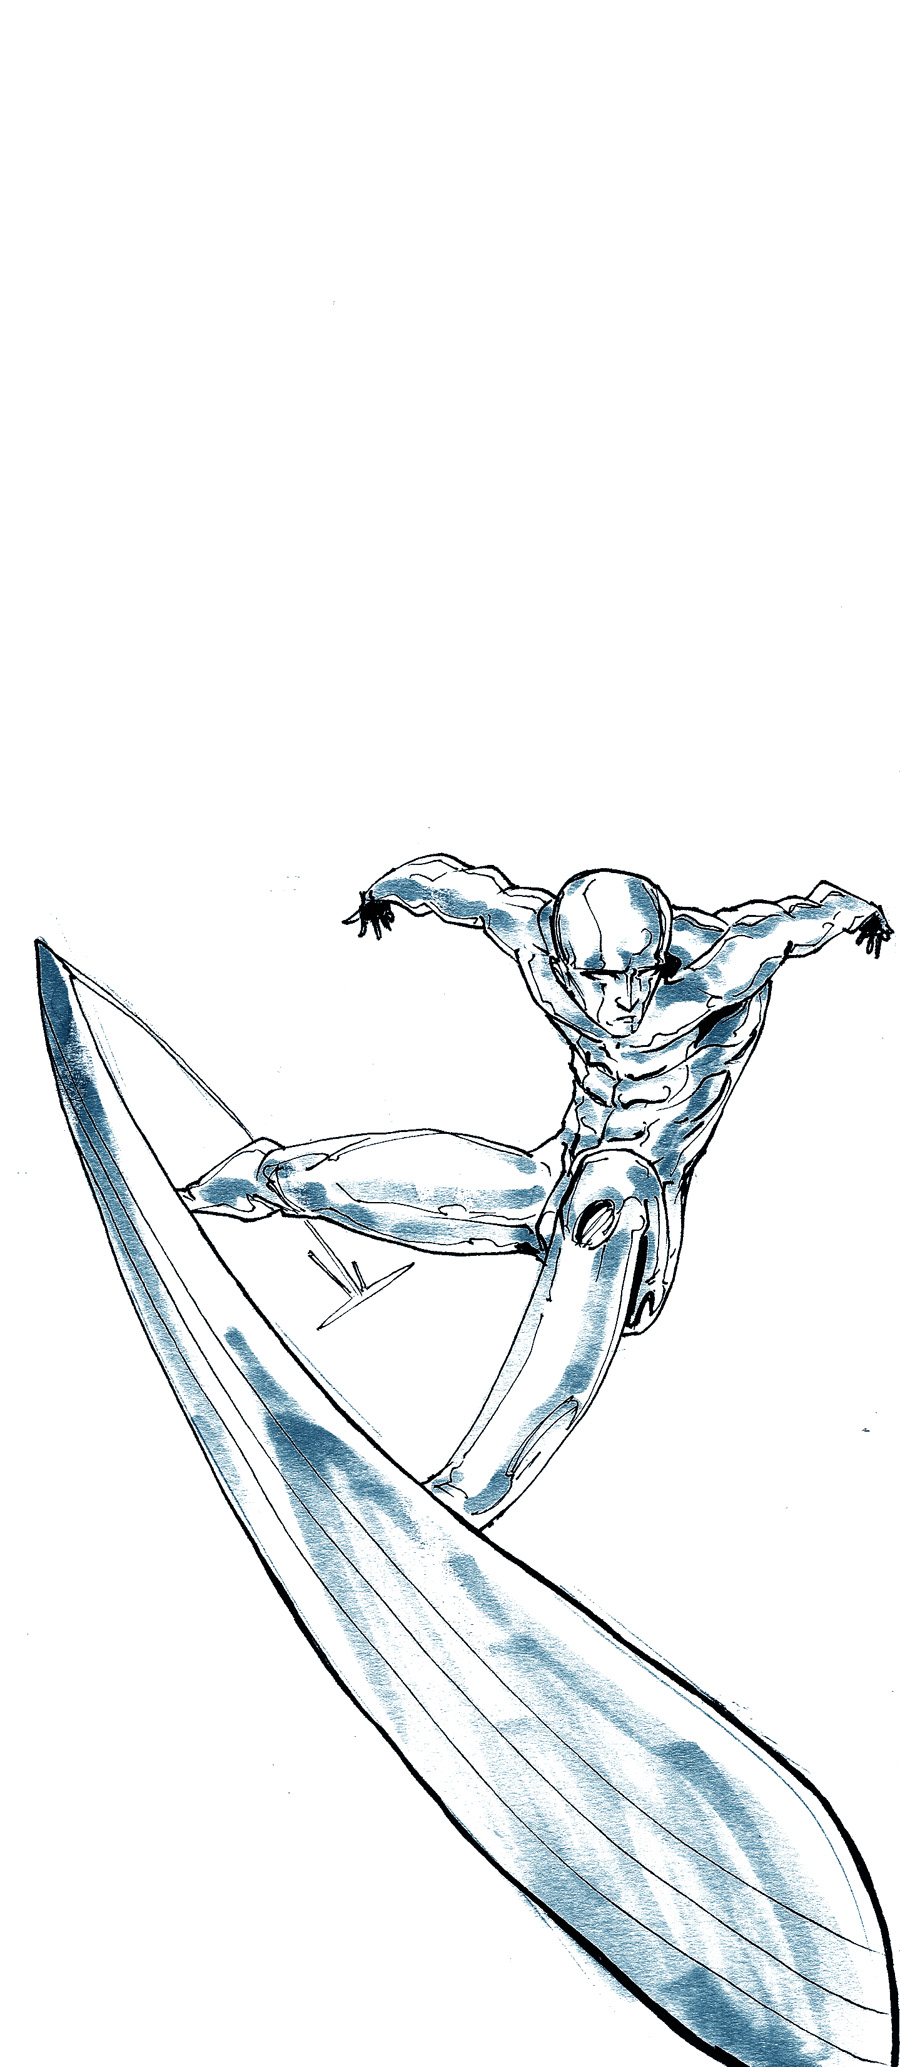 the Silver Surfer by Alberto-Rios